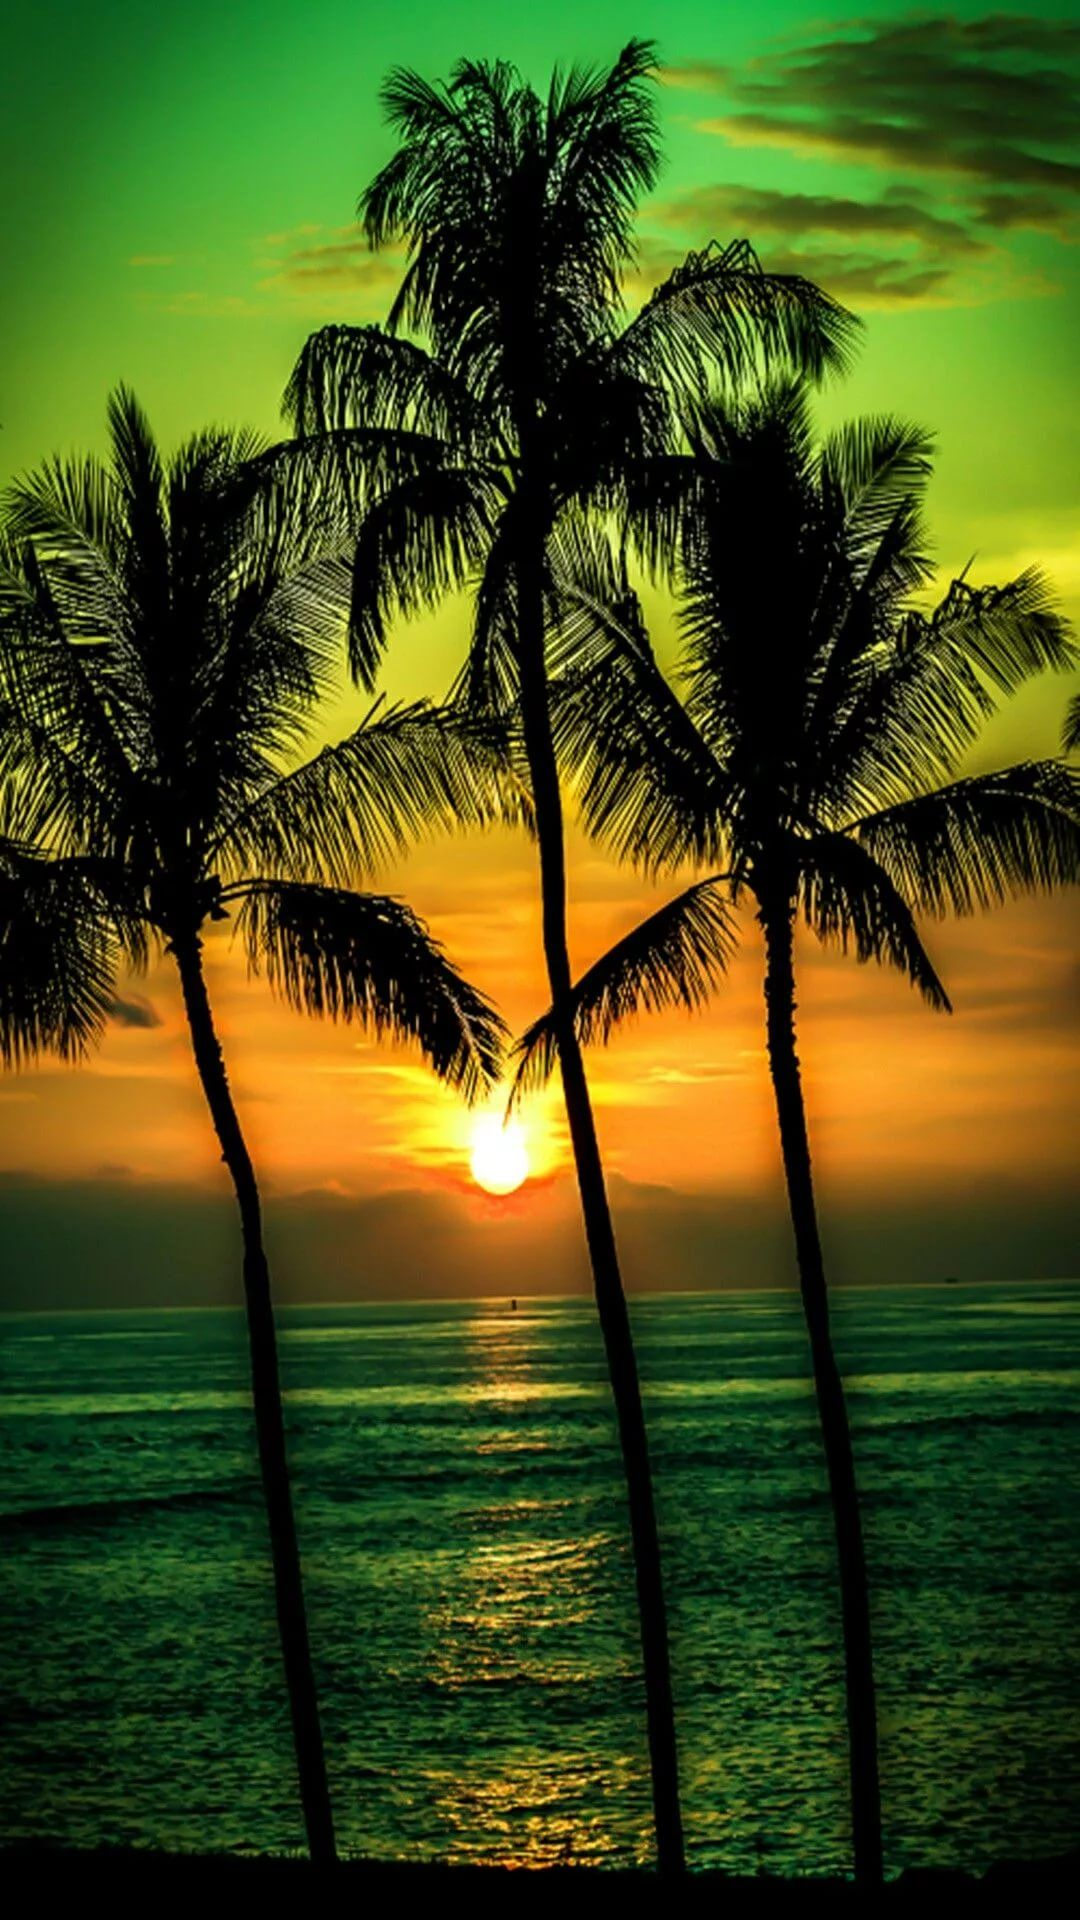 Beautiful Sunset iOS 10 wallpaper